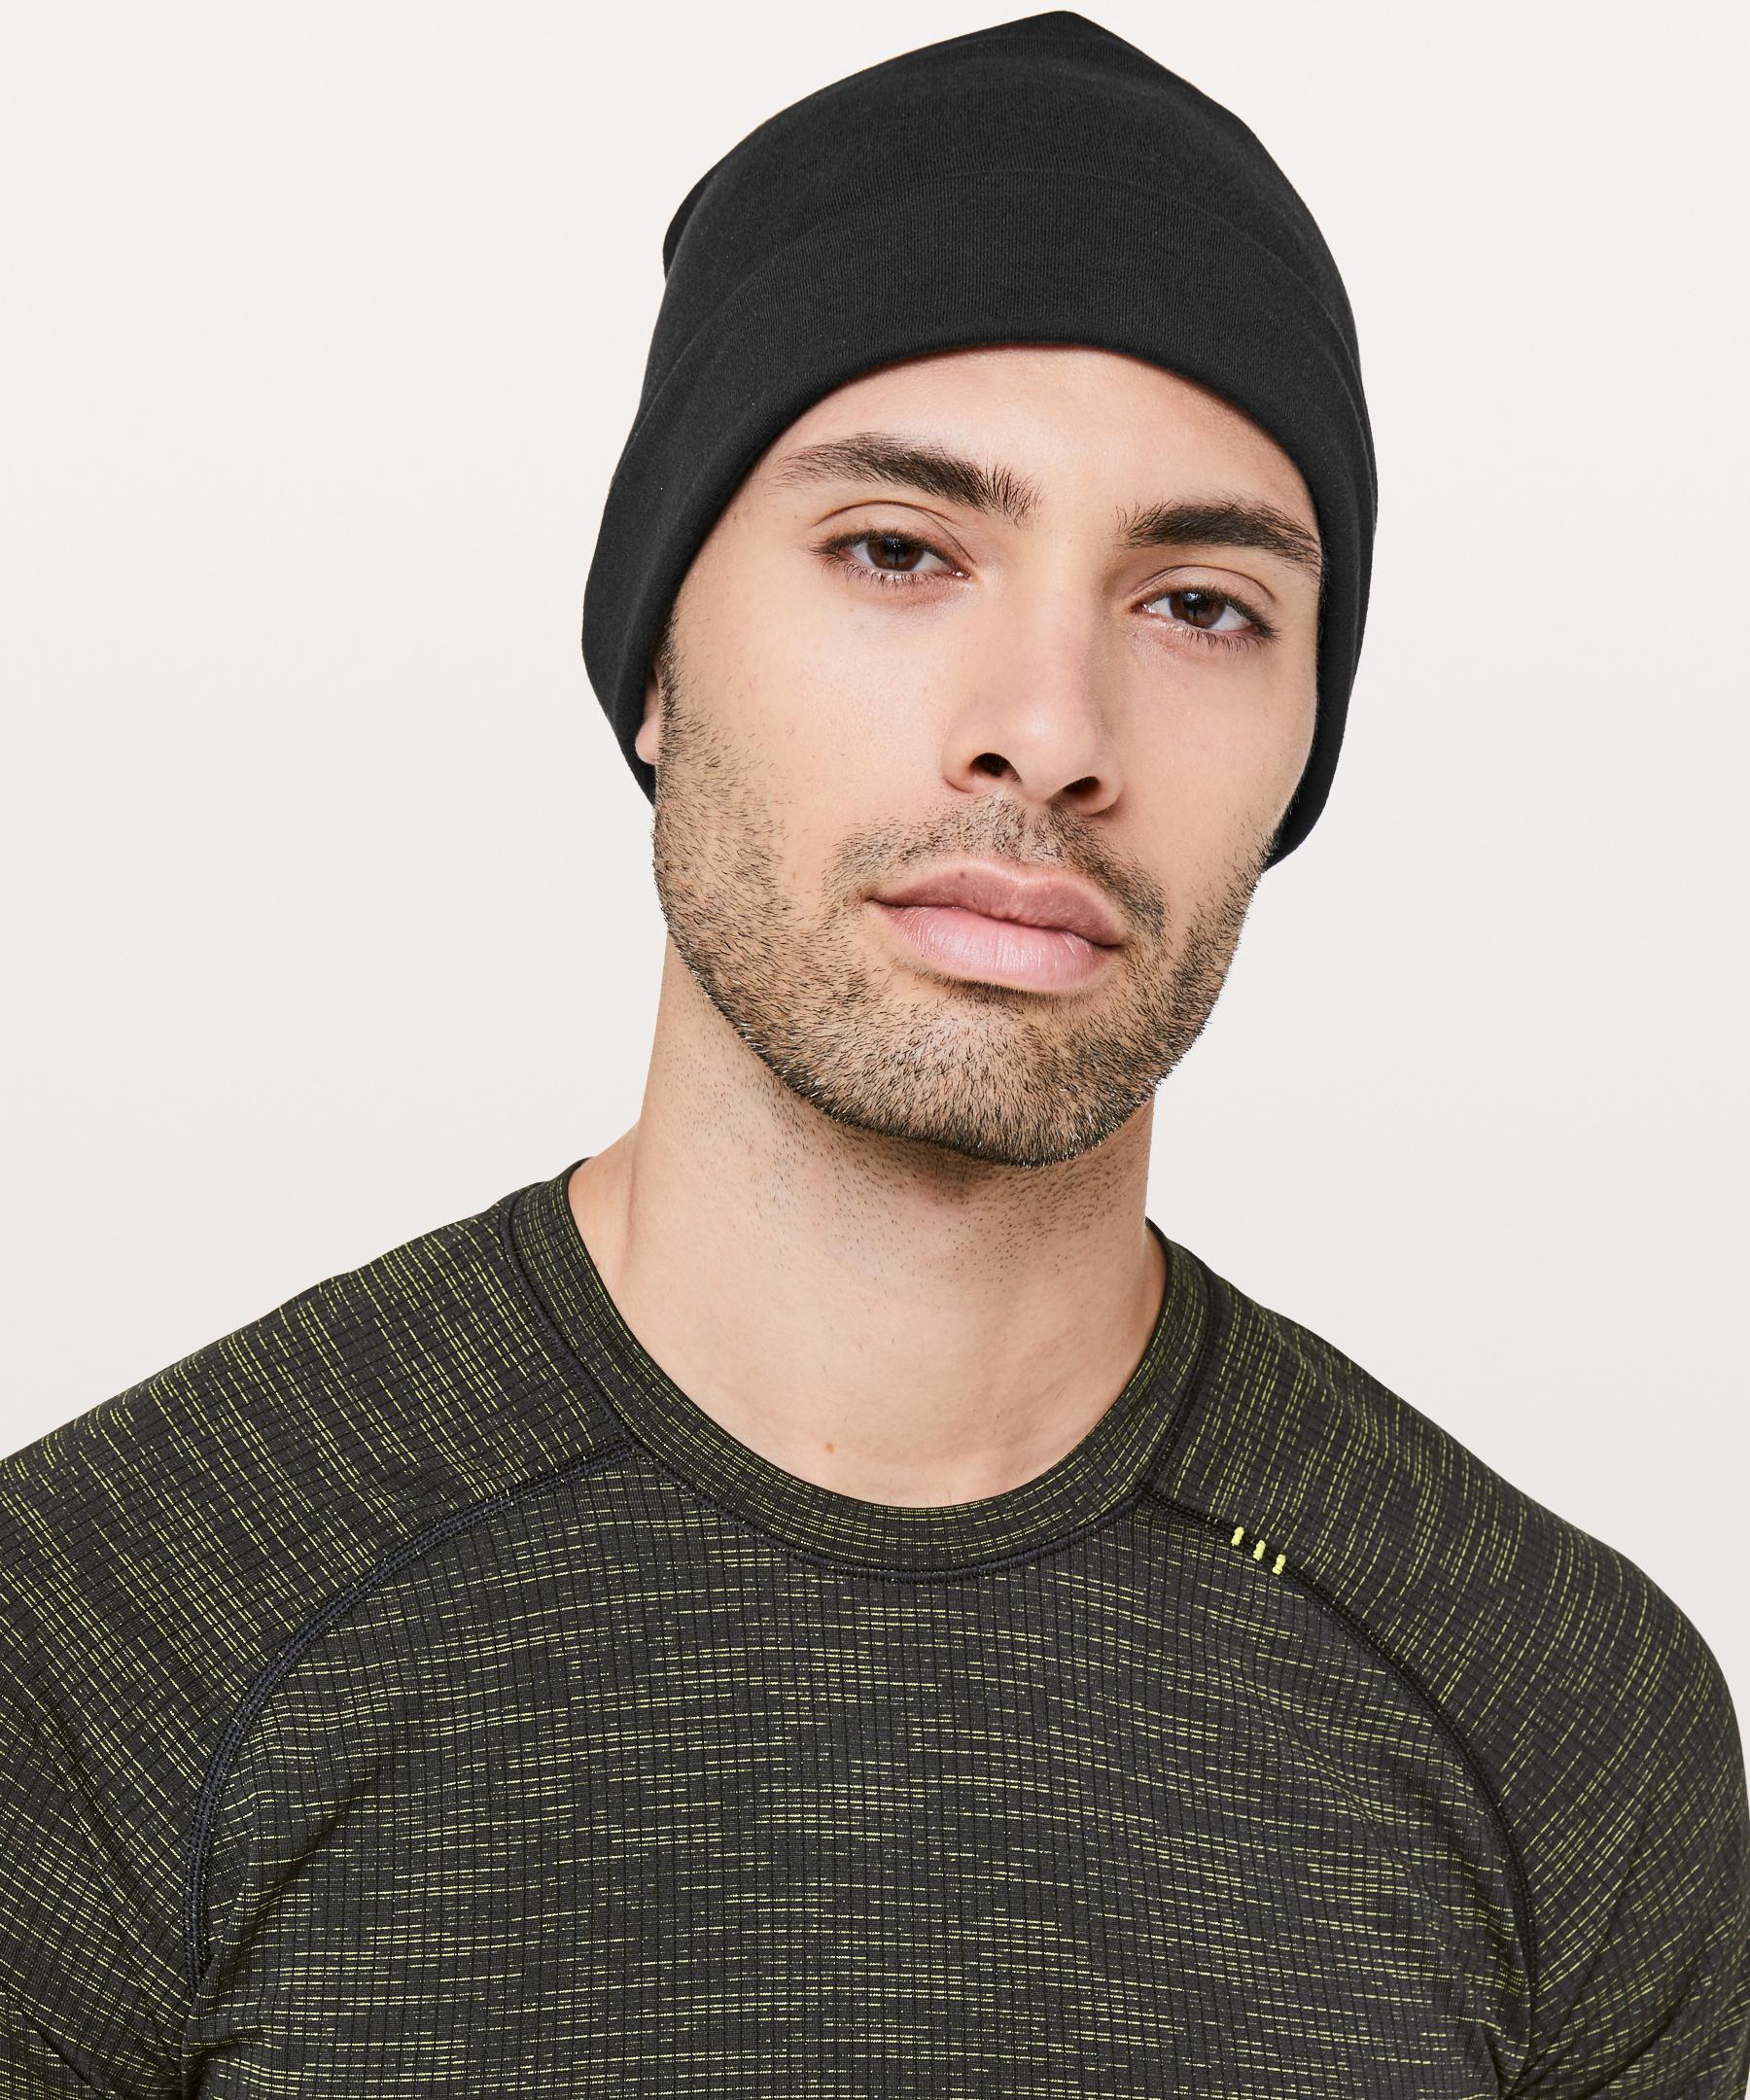 af6363861069a lululemon athletica Resolute Runner Beanie in Black for Men - Lyst